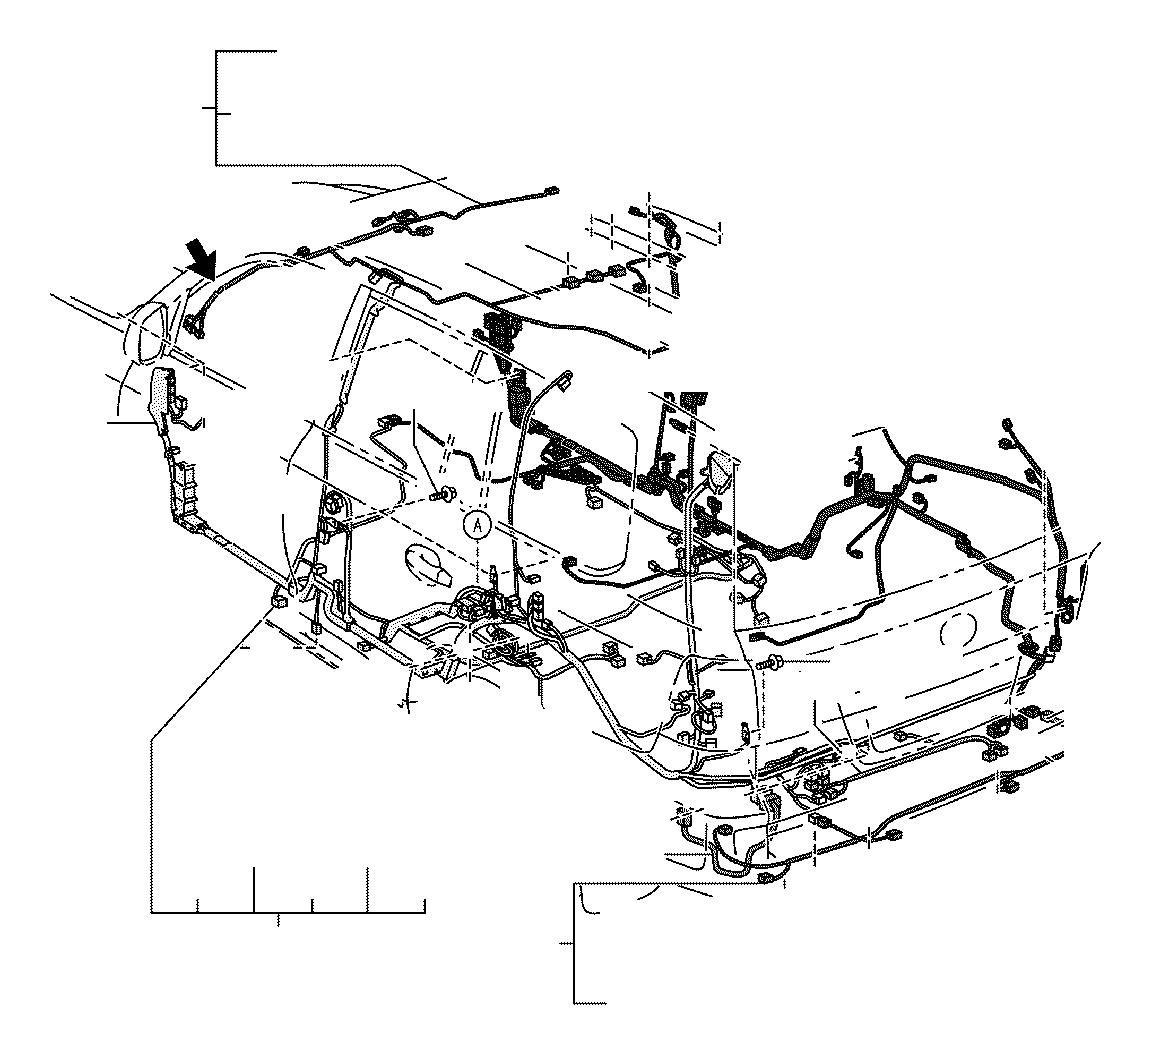 Lexus Lx 570 Wire Floor No 3 Engine Connector Panel